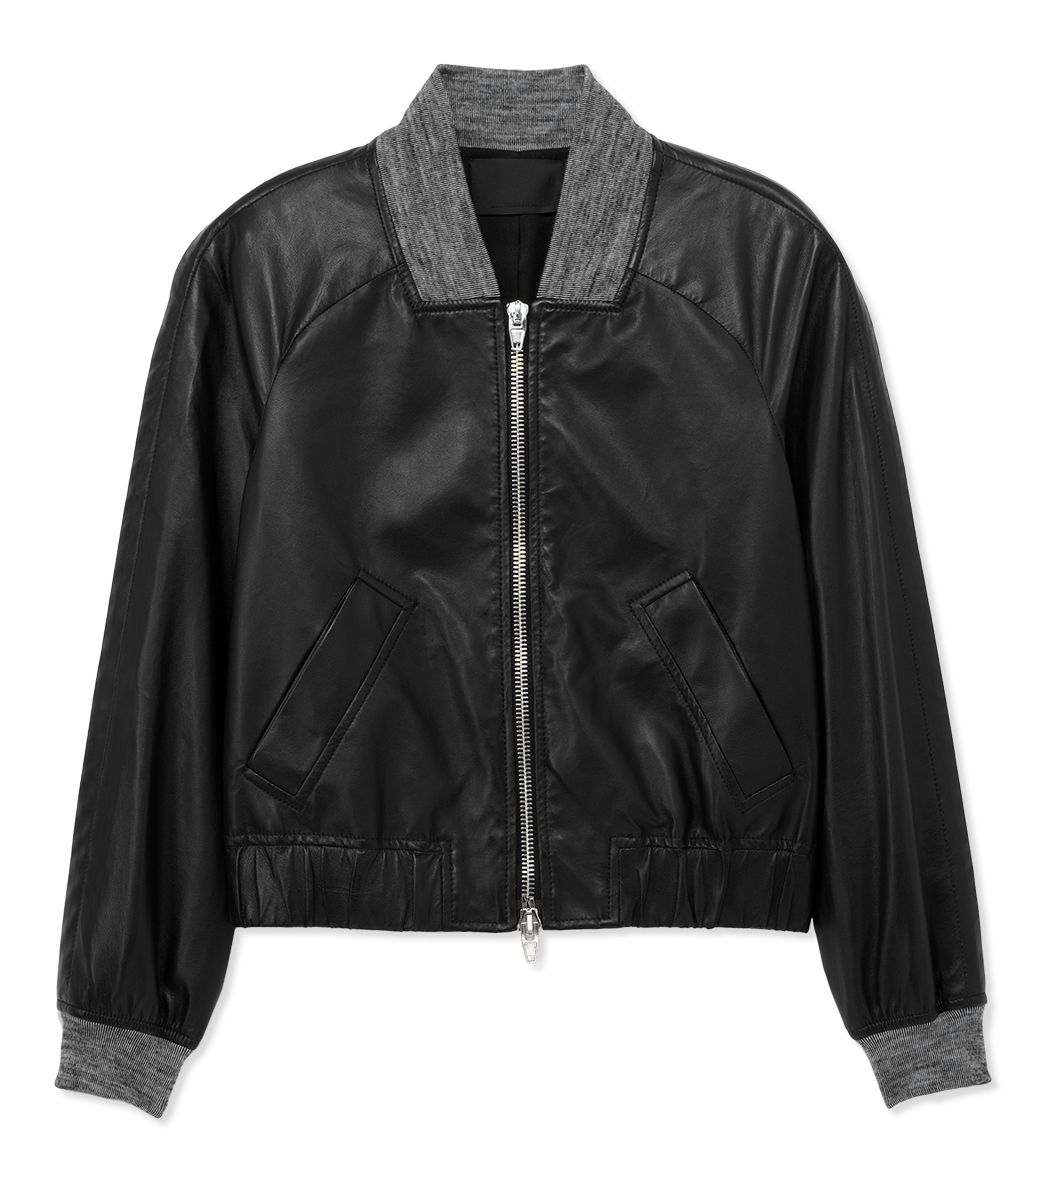 Edgy Moto Chic on #ShopBAZAAR: Alexander Wang Cropped Leather Bomber Jacket